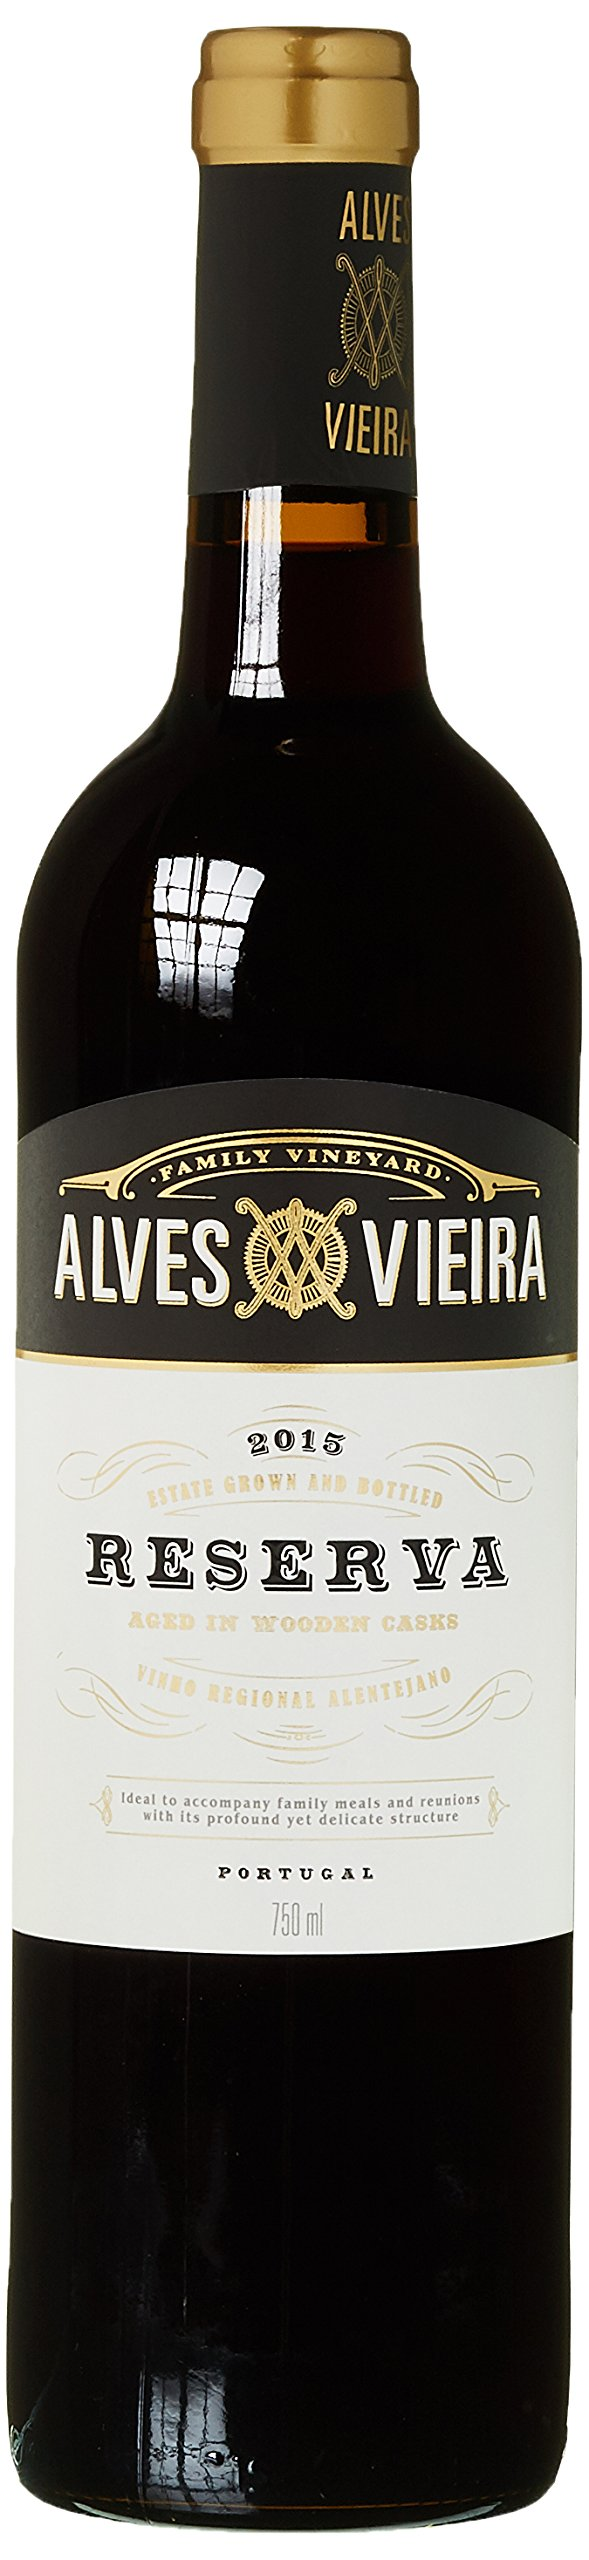 Alves-Vieira-Syrah-2014-Trocken-1-x-075-l